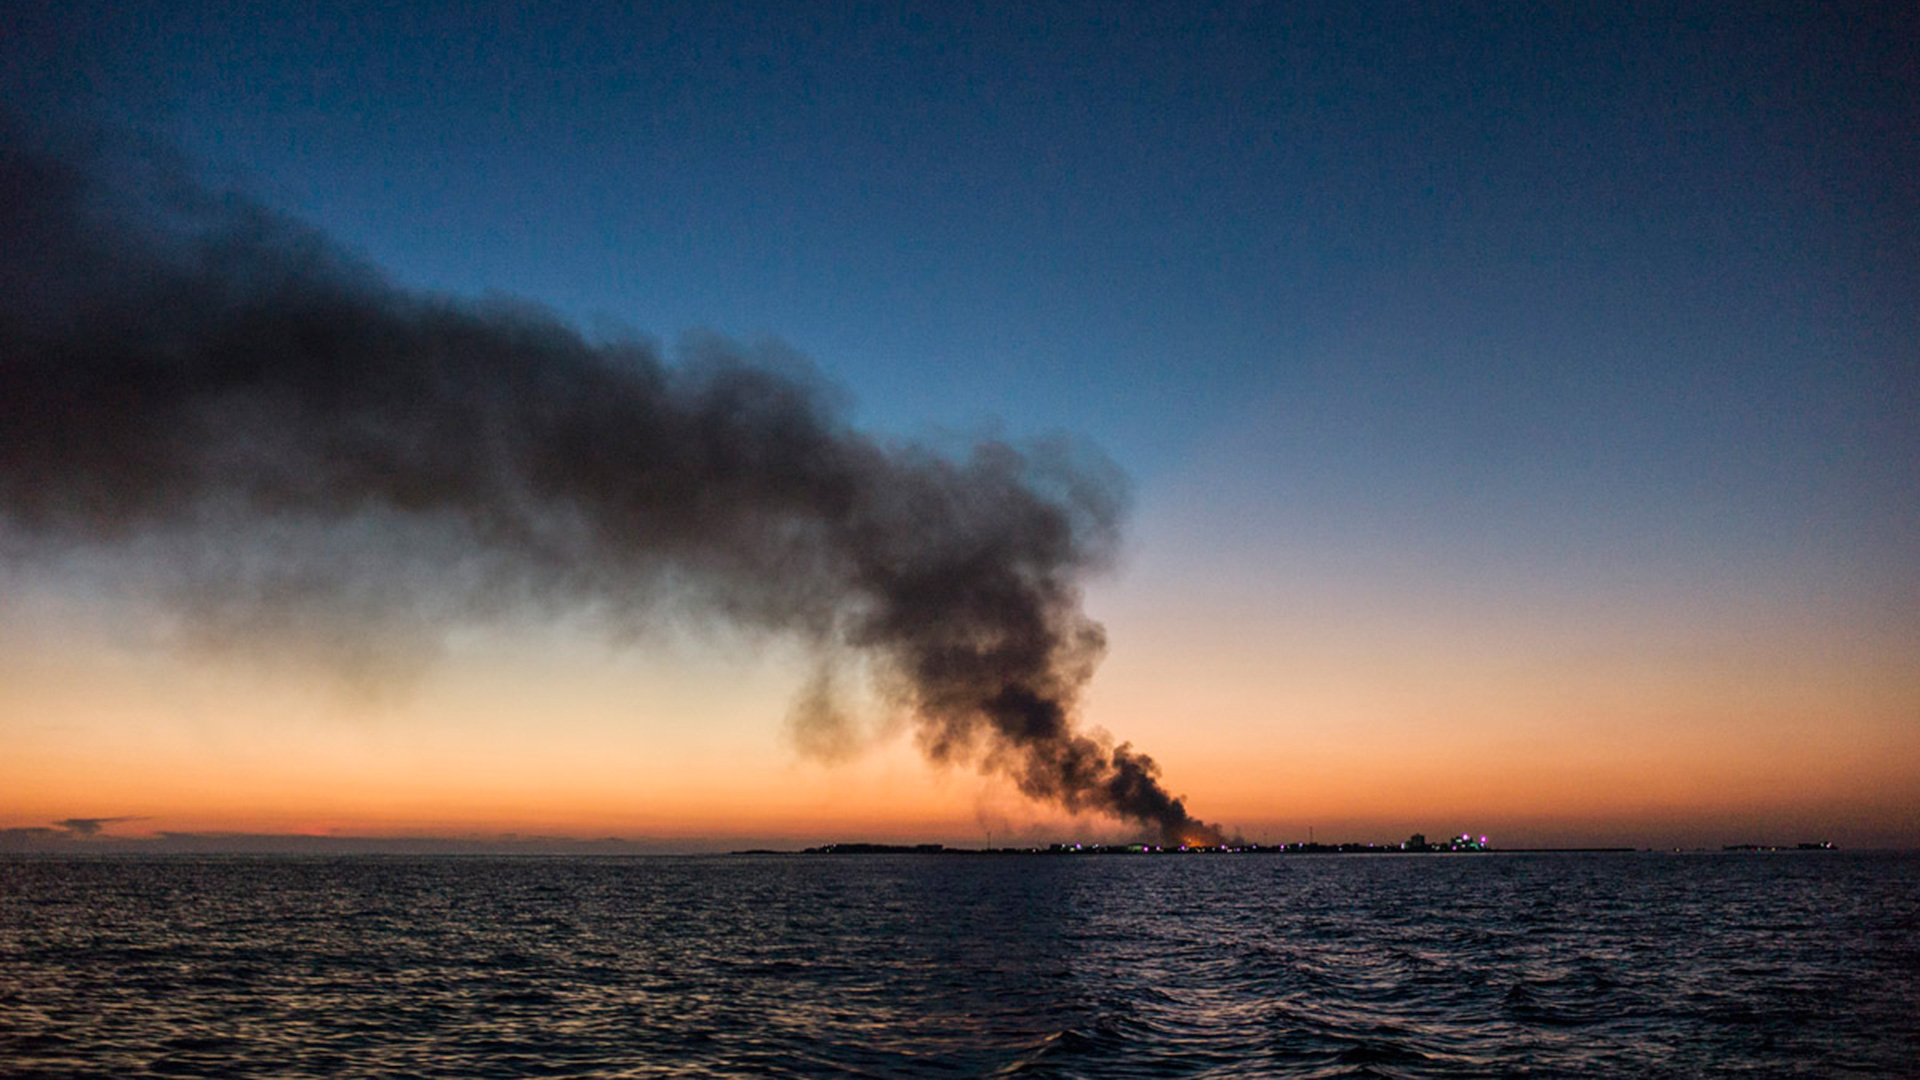 smoke billows on the horizon